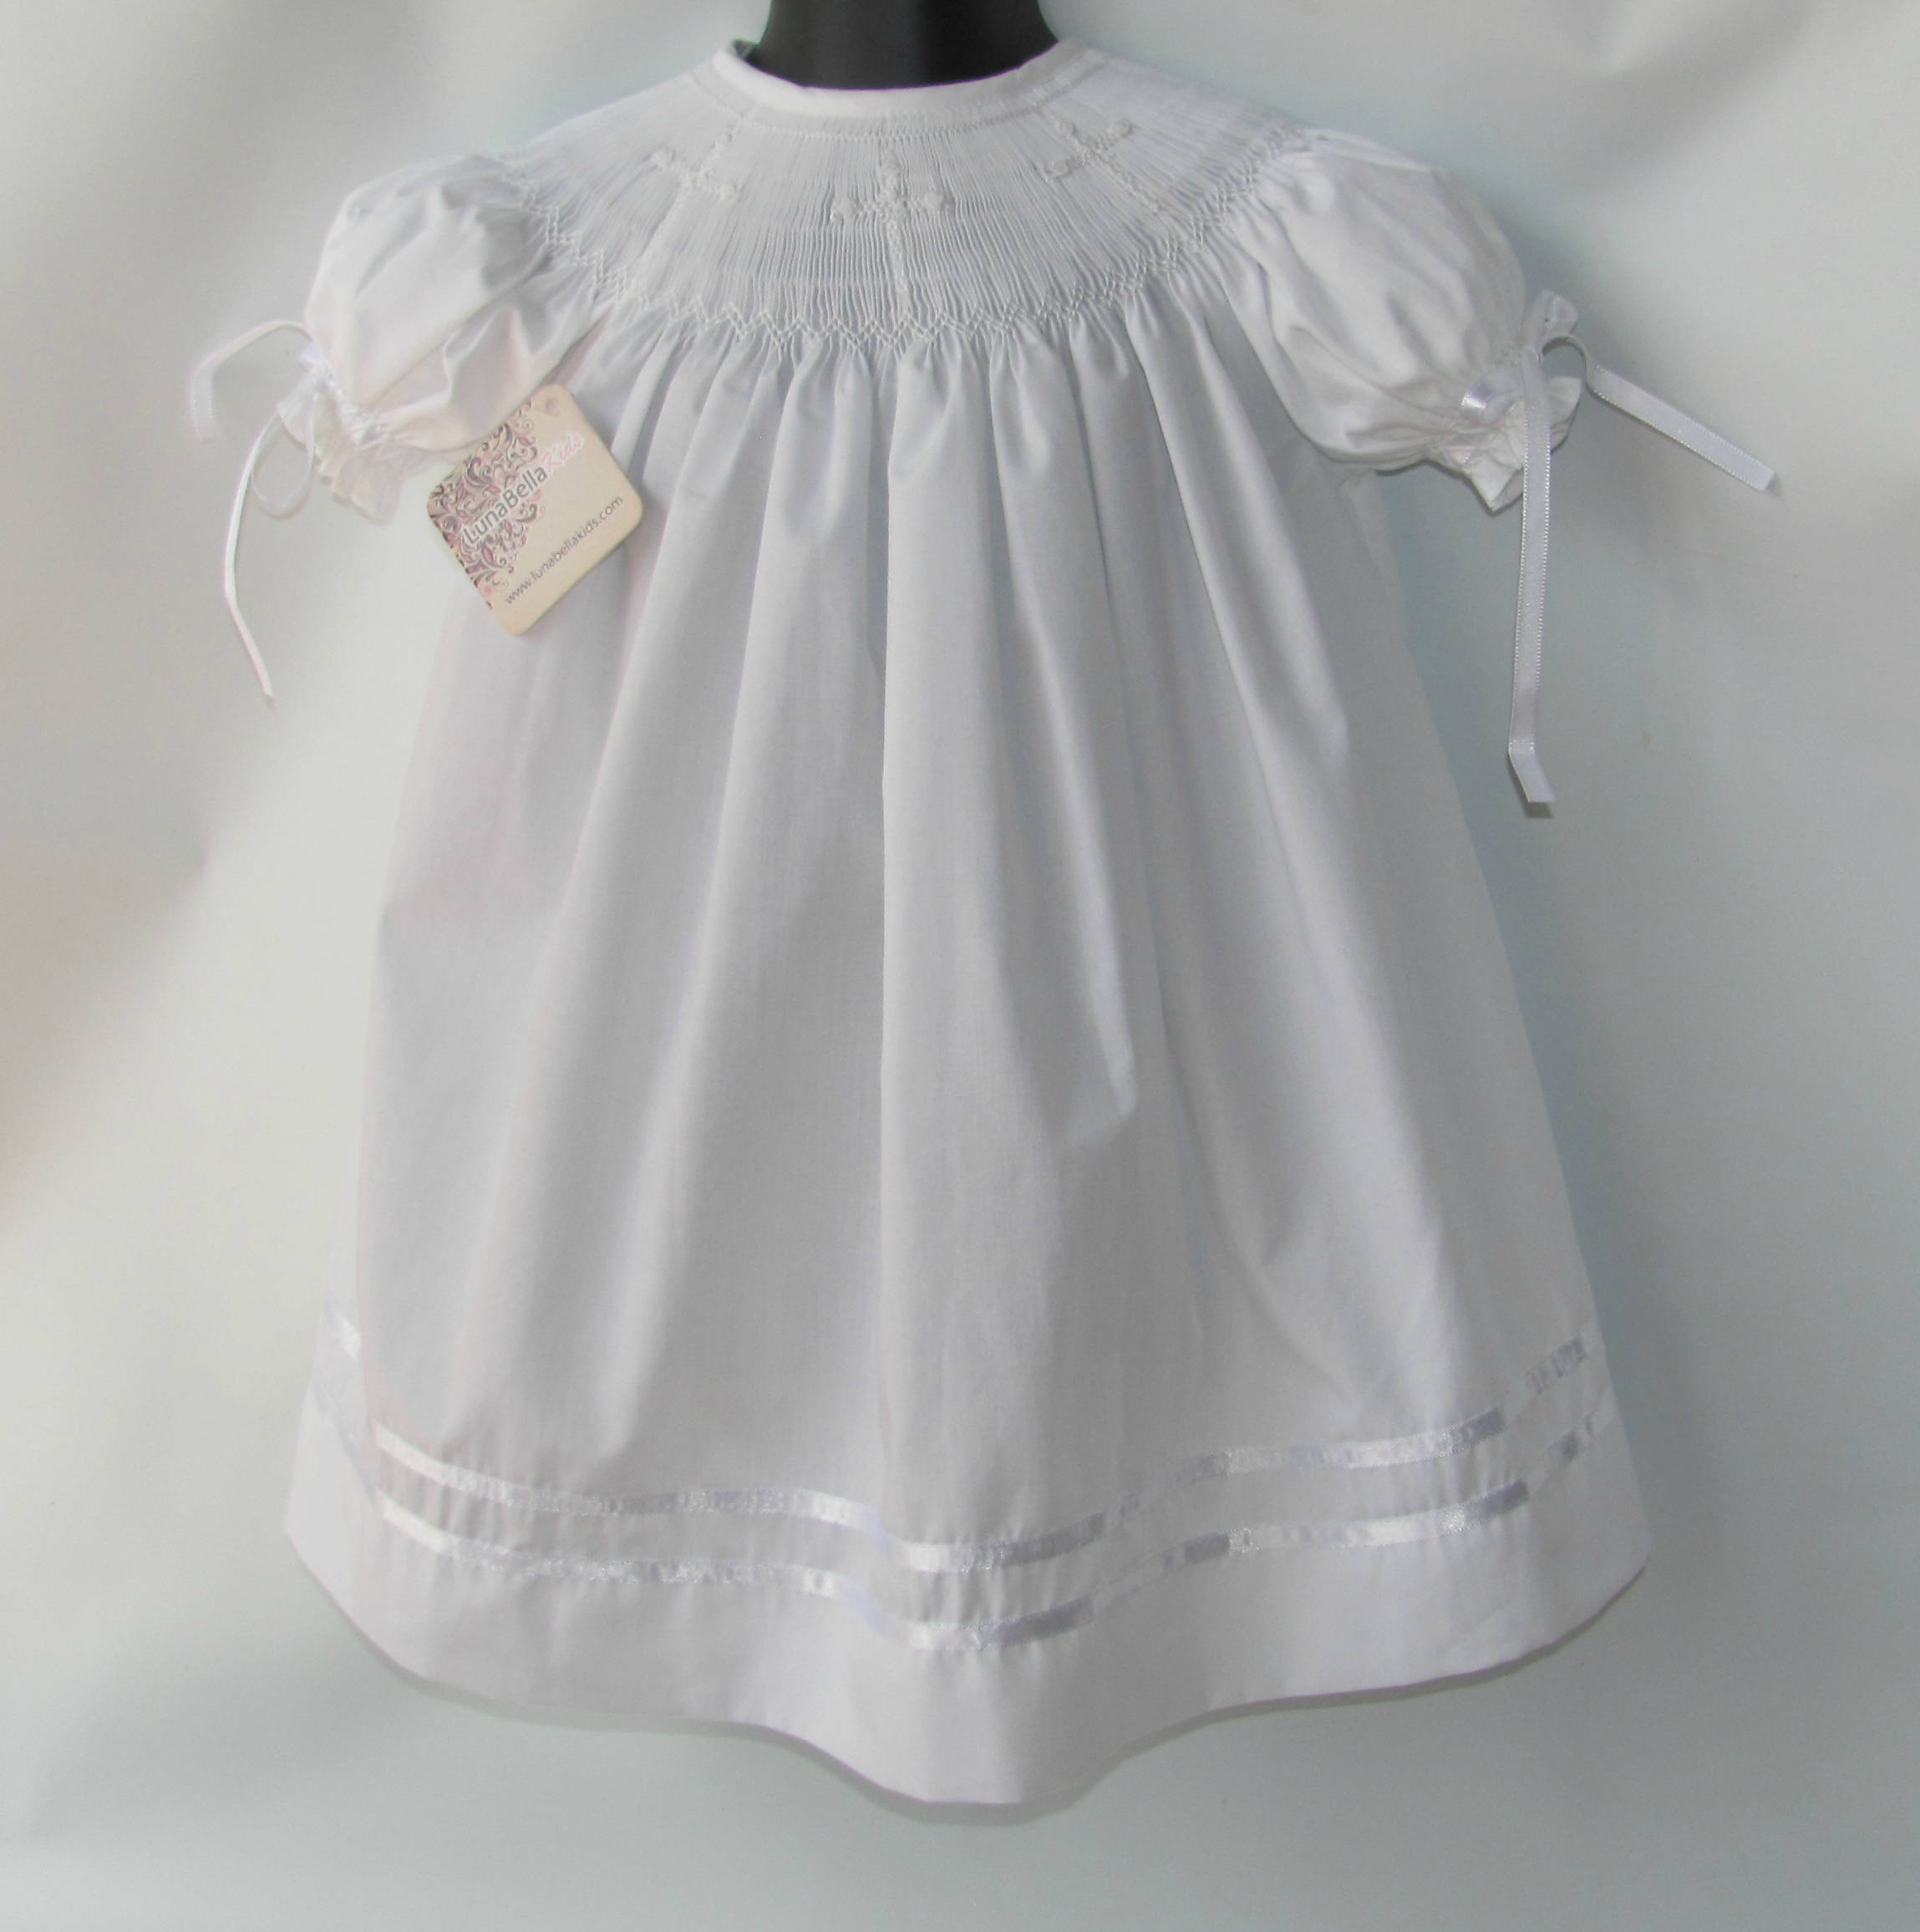 Smocked Christening Dress Smock White Dress Smock Baby Dress